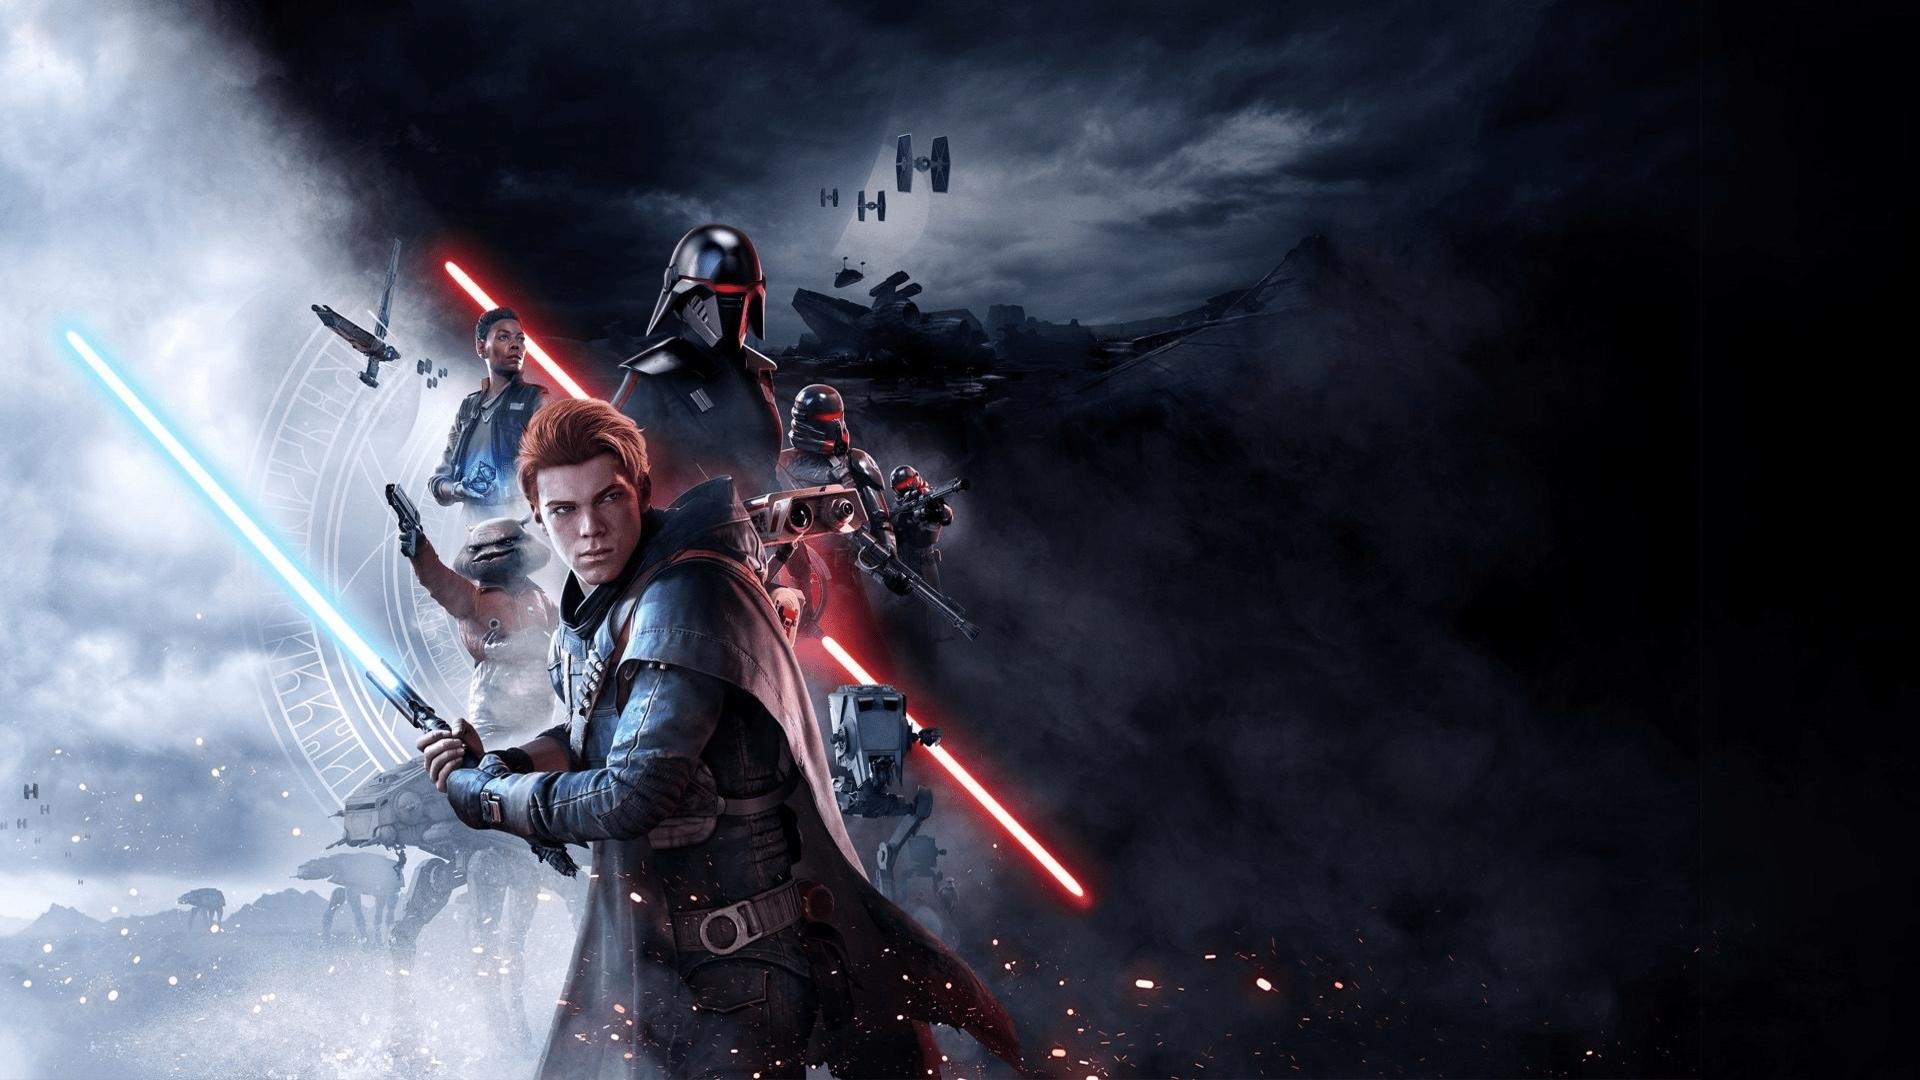 Jedi Fallen Order Wallpapers Top Free Jedi Fallen Order Backgrounds Wallpaperaccess